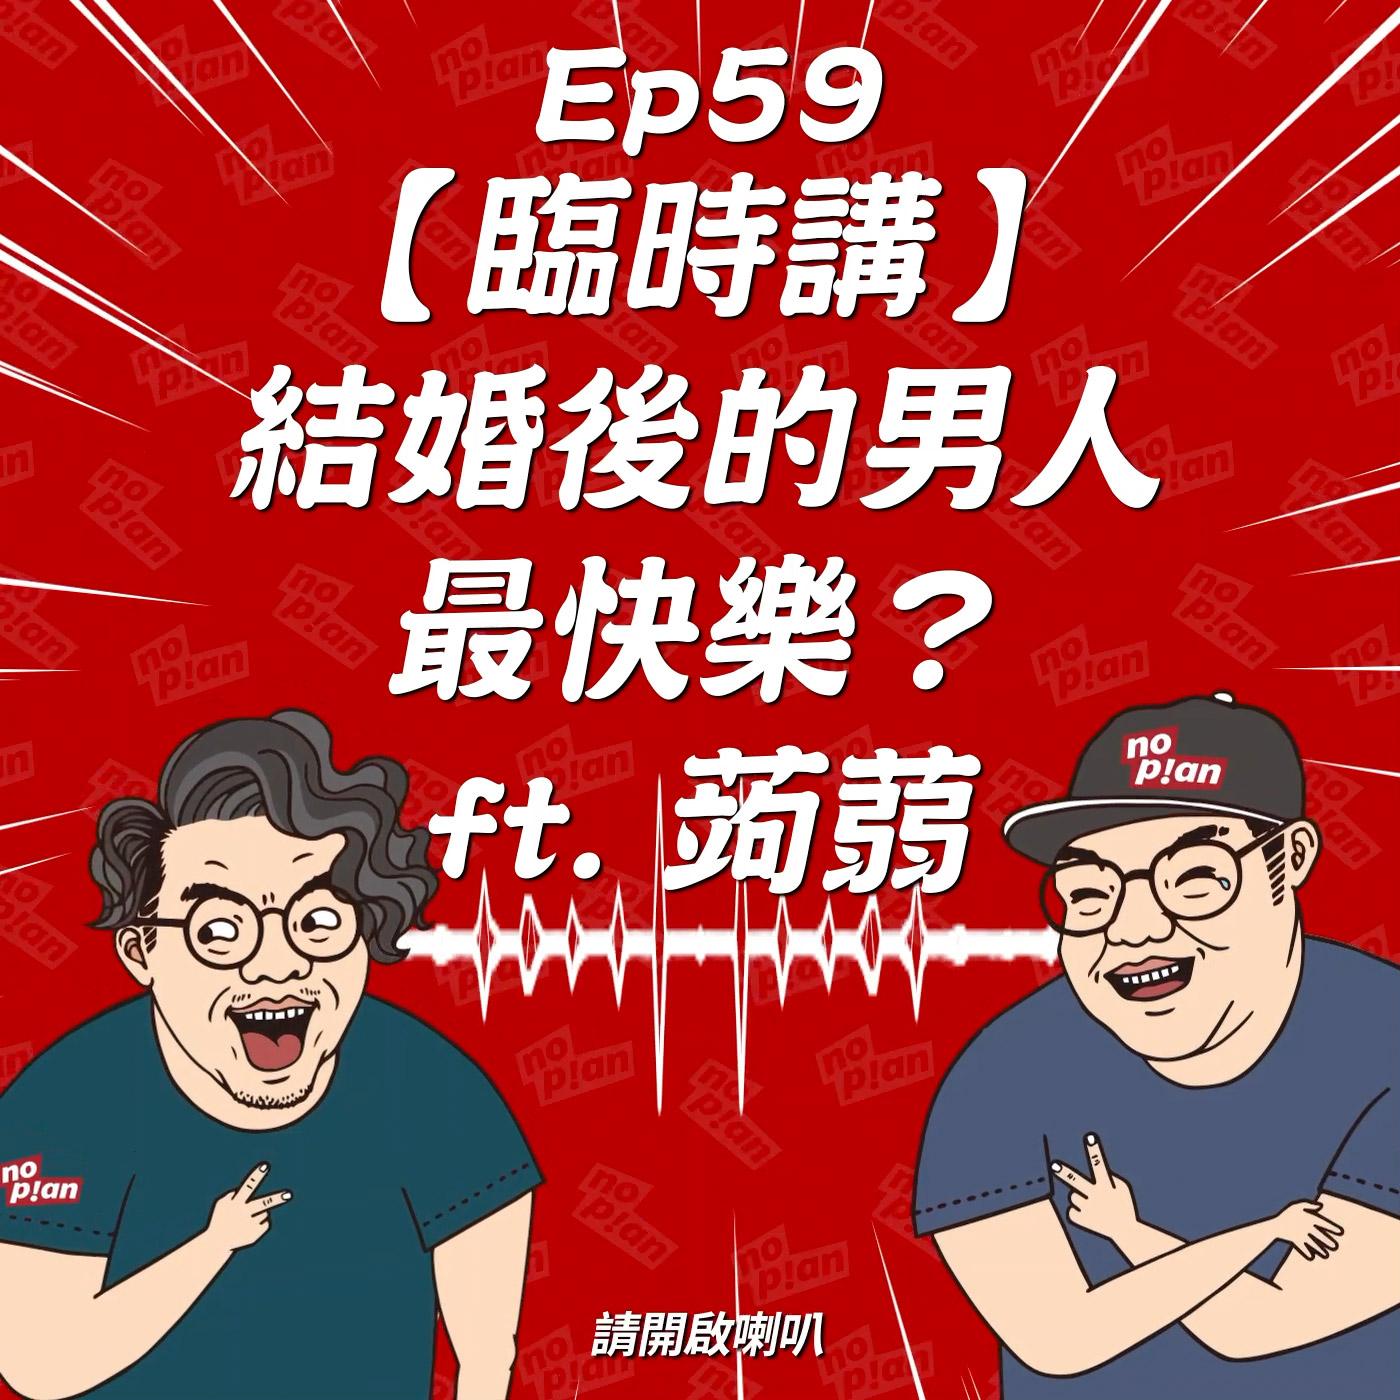 EP059 【臨時講】結婚後的男人最快樂?  ft. 蒟蒻